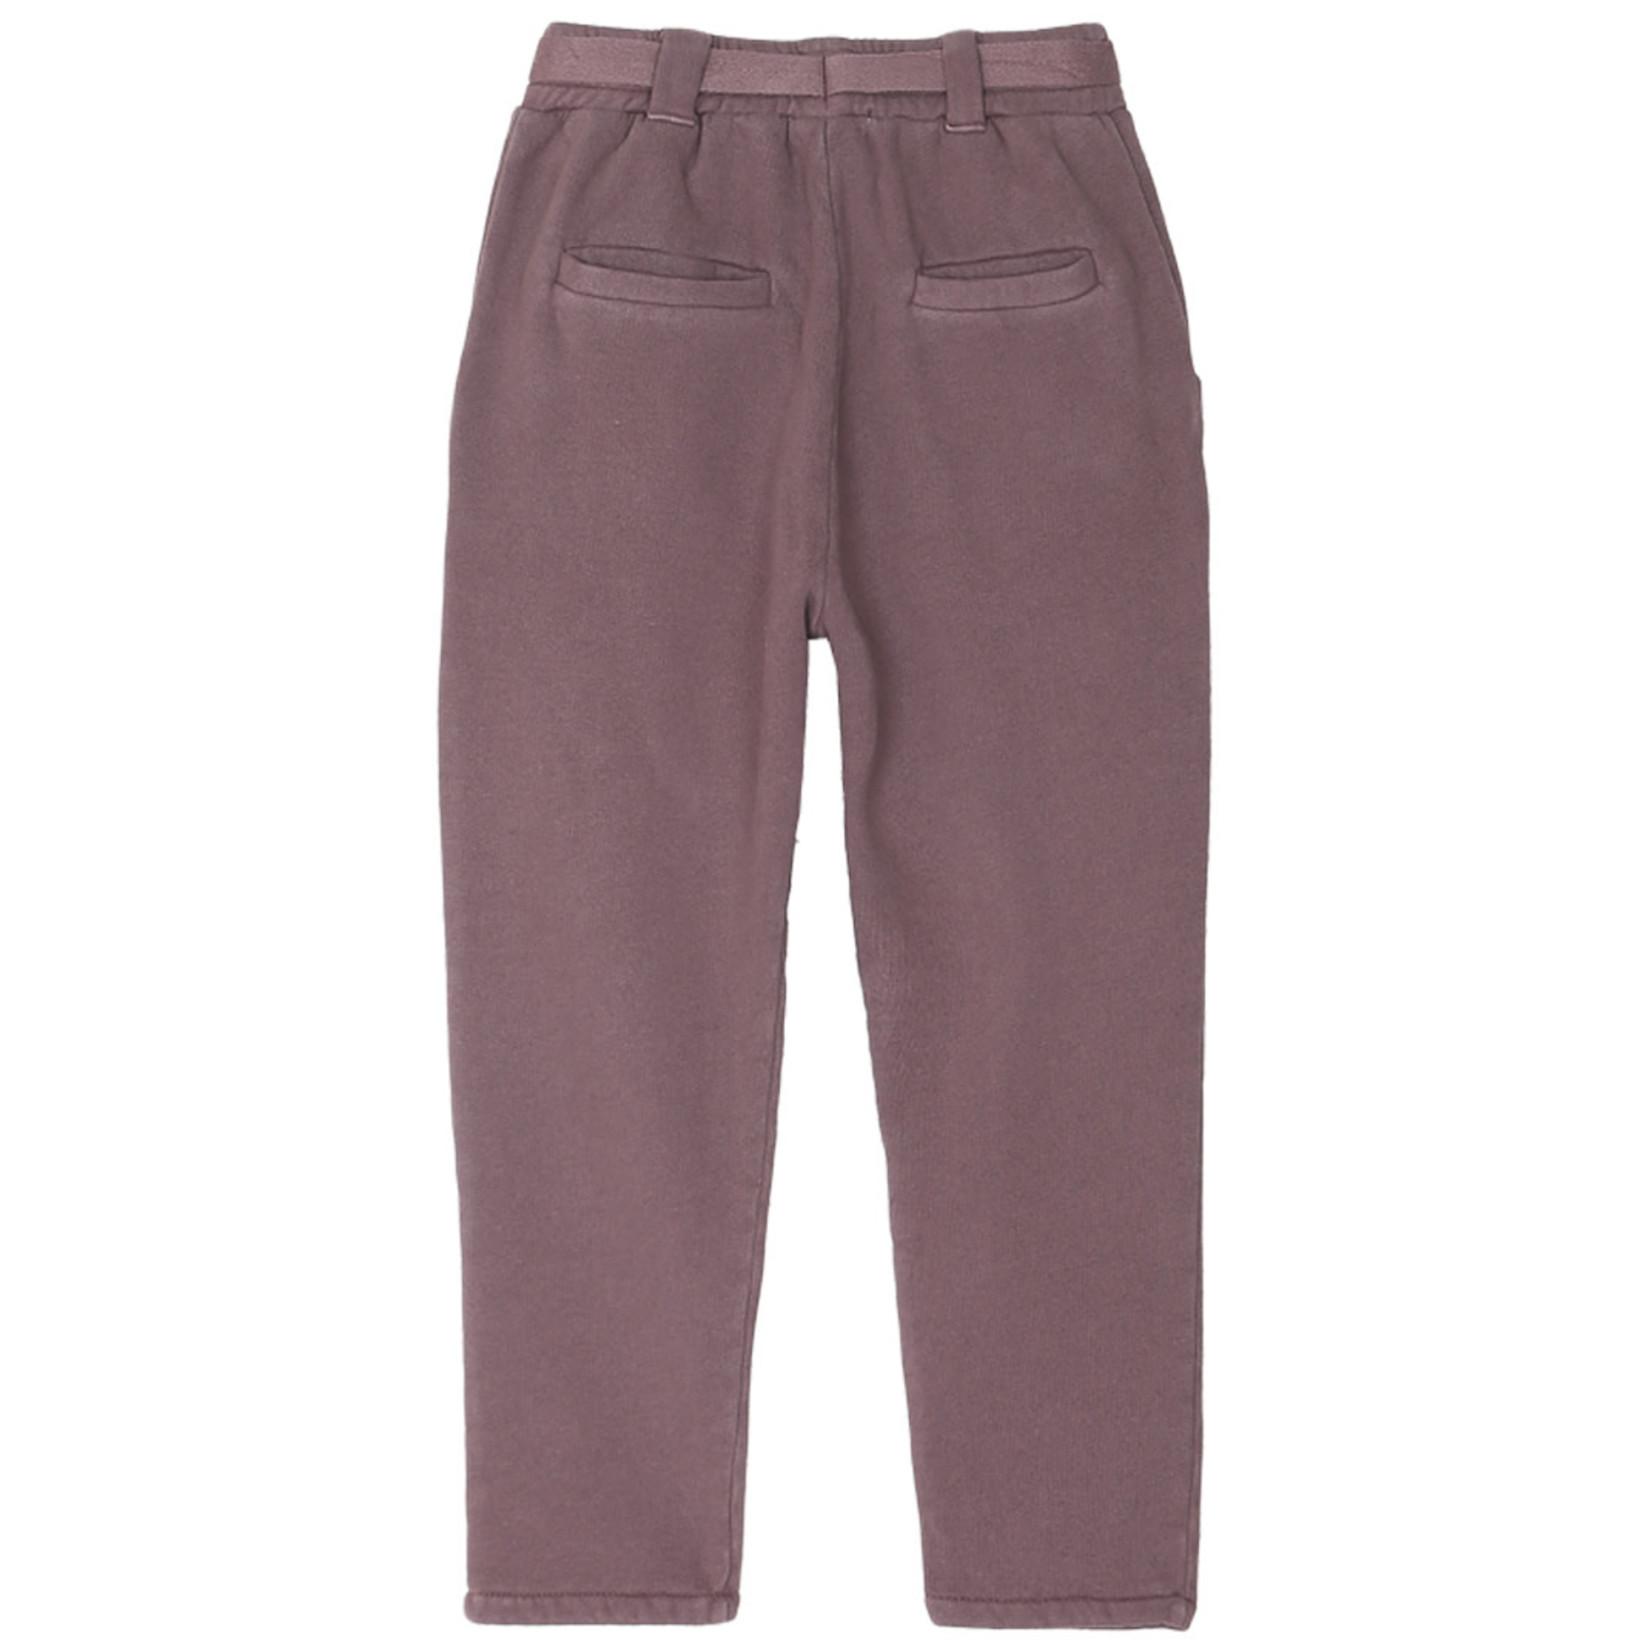 EMILE ET IDA EMILE ET IDA  pantalon PRUNE